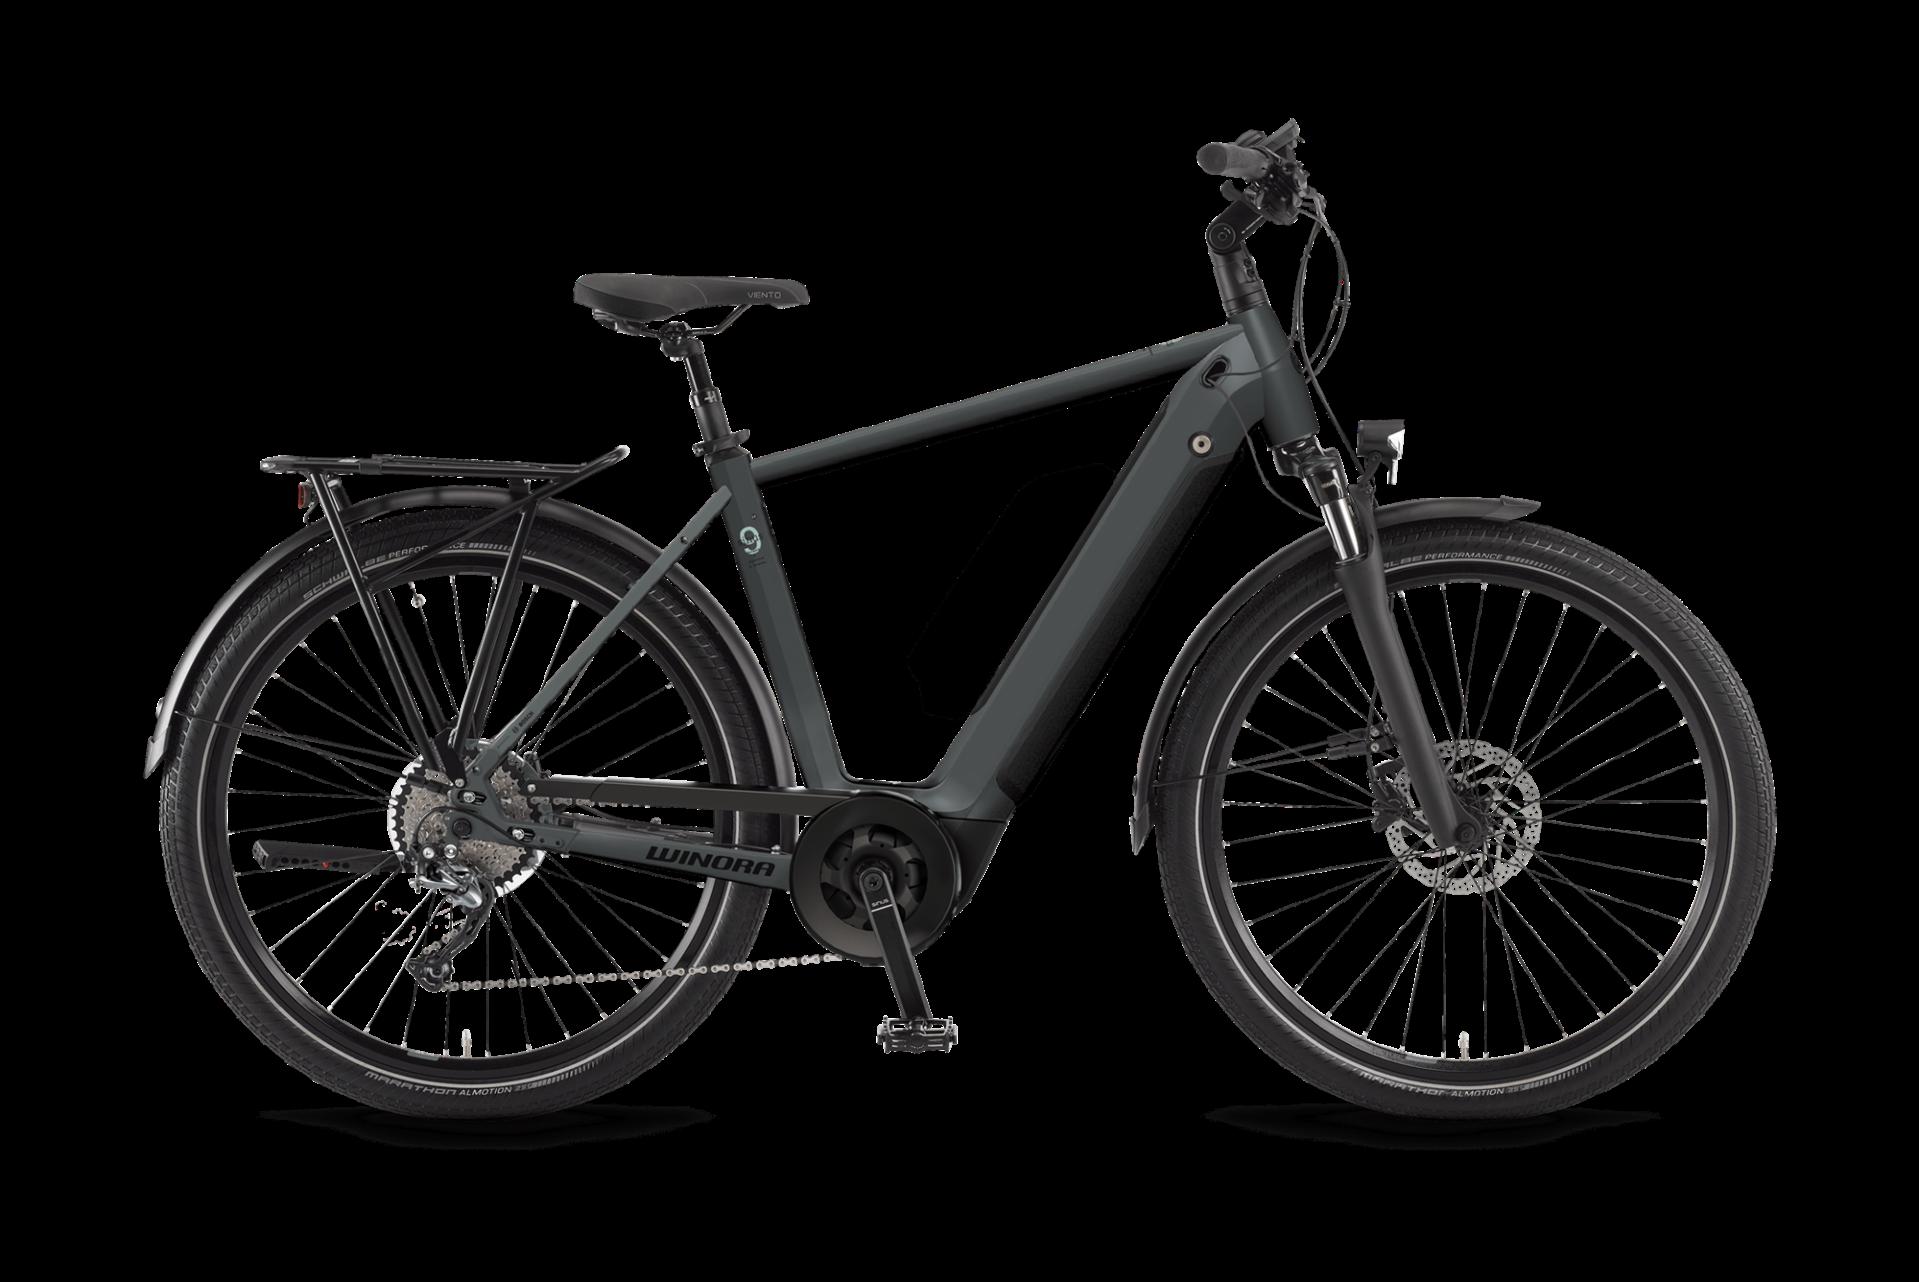 WINORA Sinus 9 férfi trekking pedelec kerékpár - 56 cm (2021)